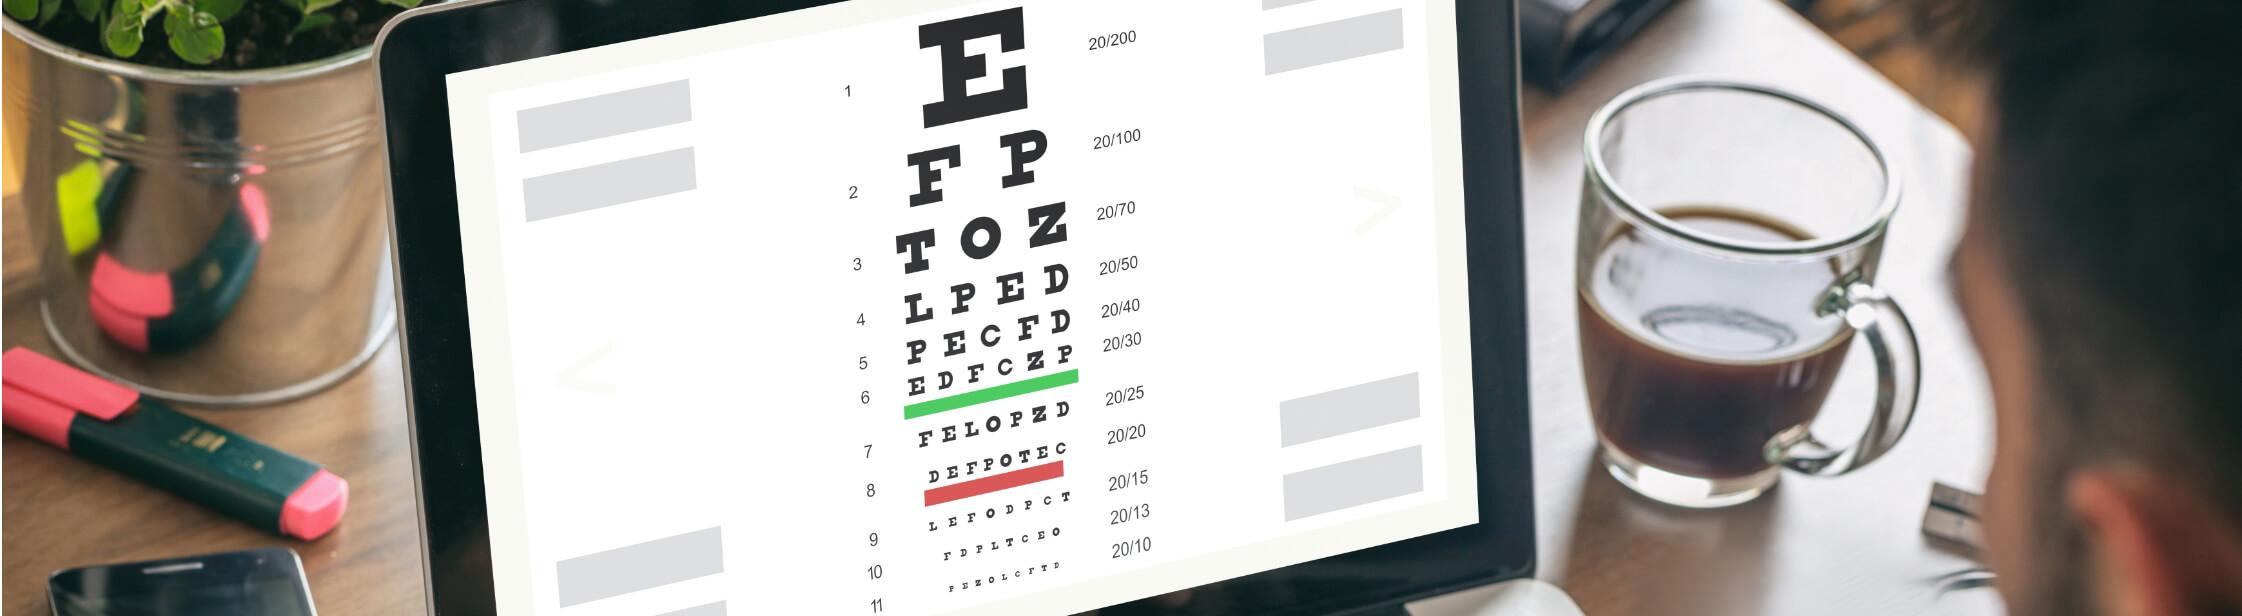 test ocular ipad online